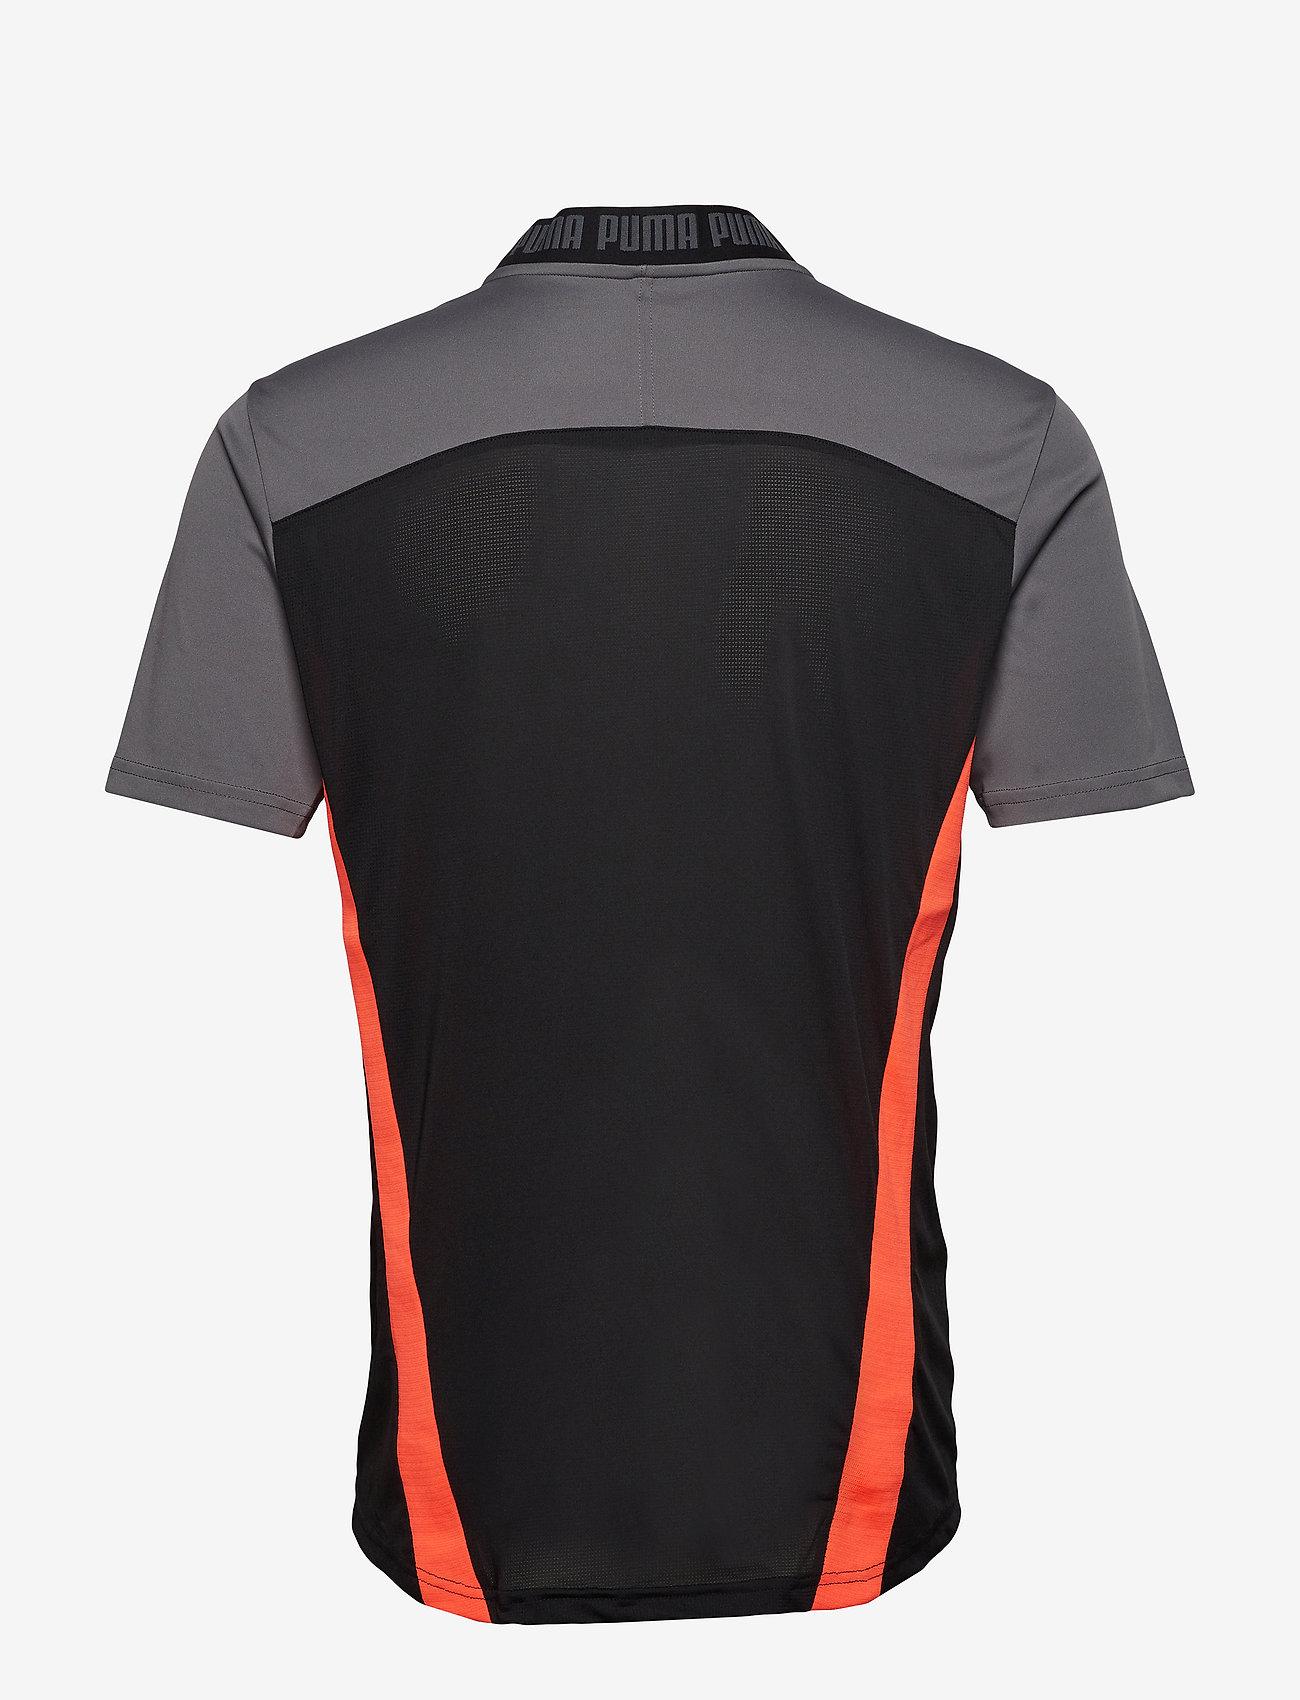 PUMA - ftblNXT Pro Tee - football shirts - puma black-nrgy red - 1